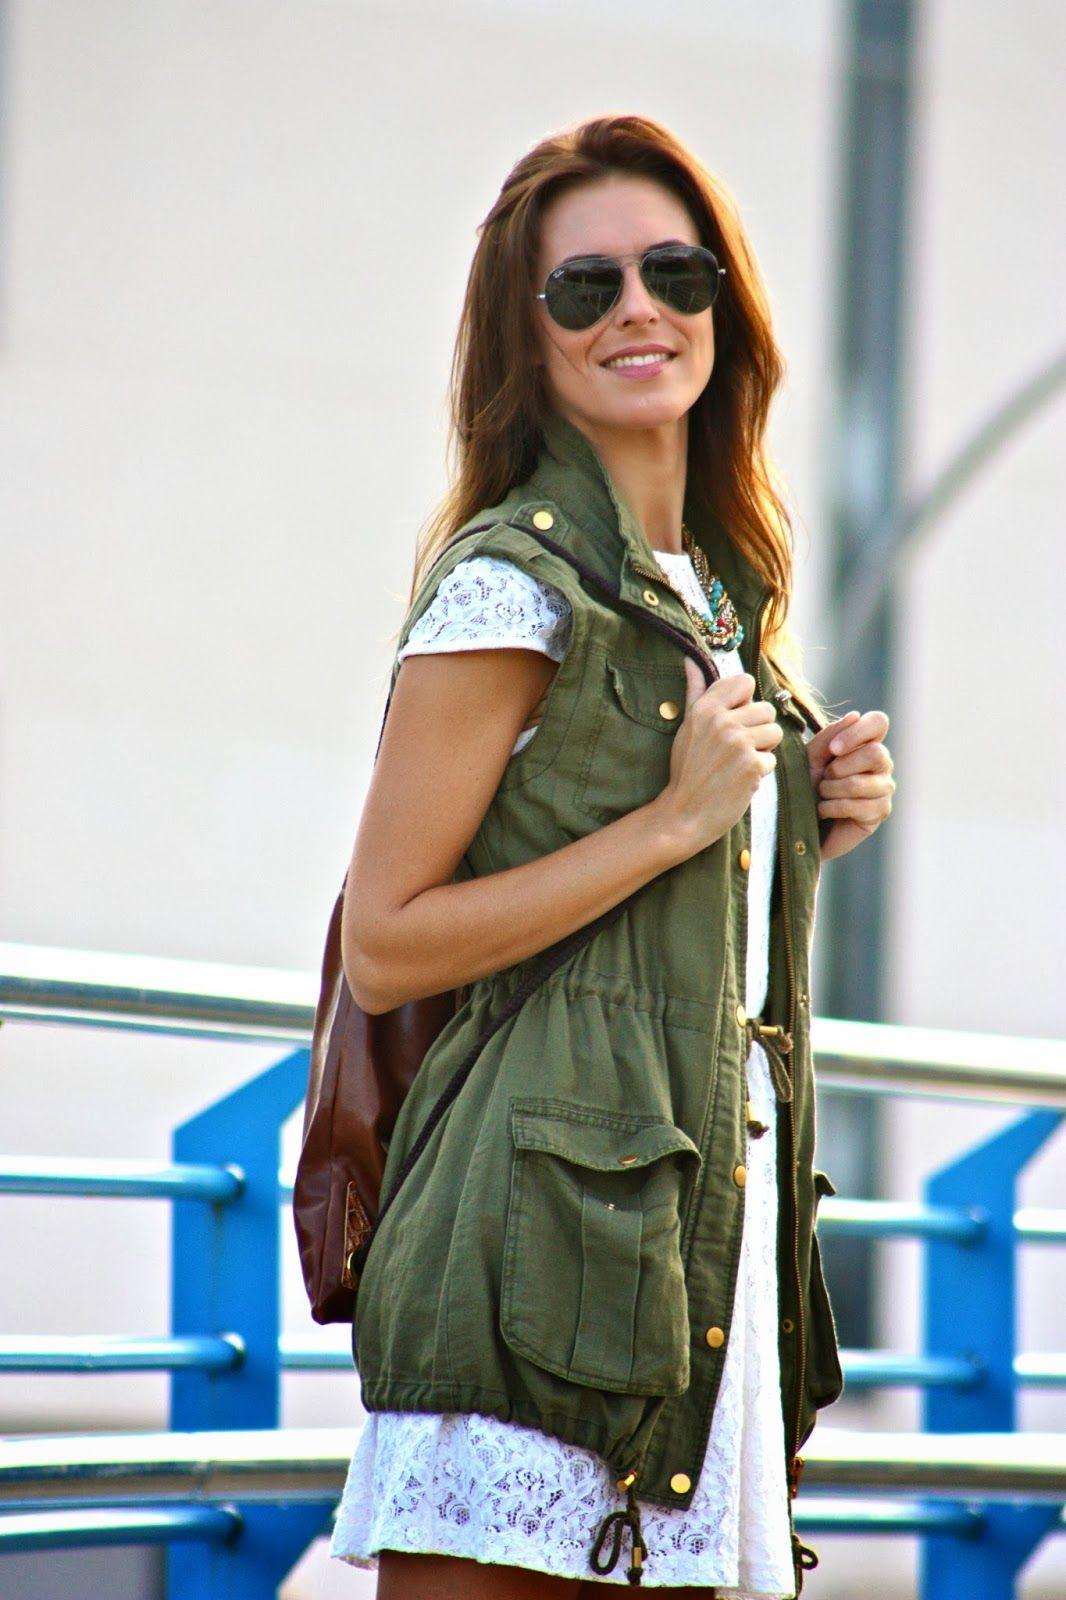 Vestido lencero verde militar